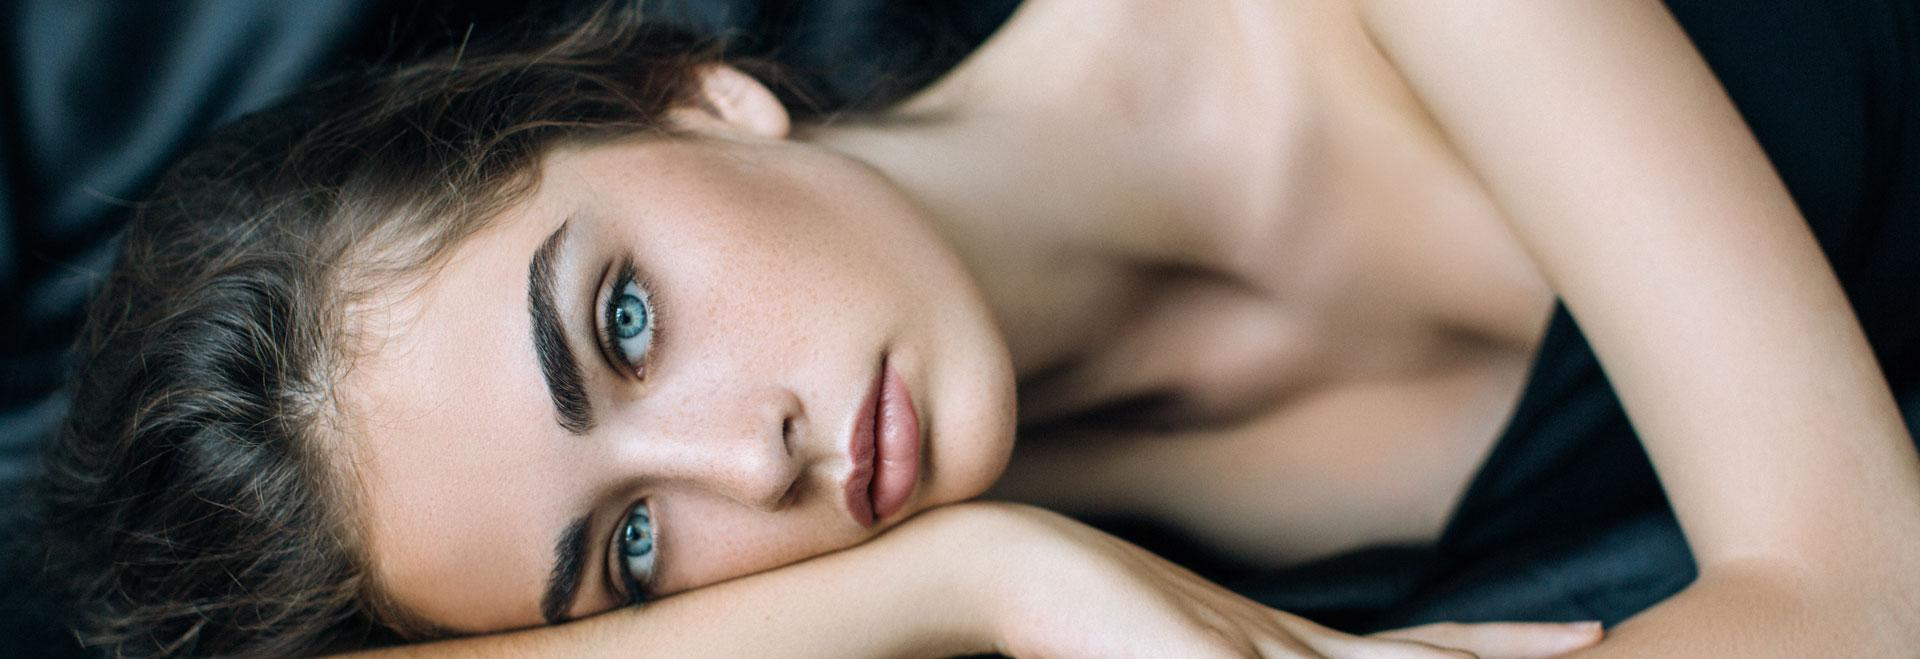 servizio make-up